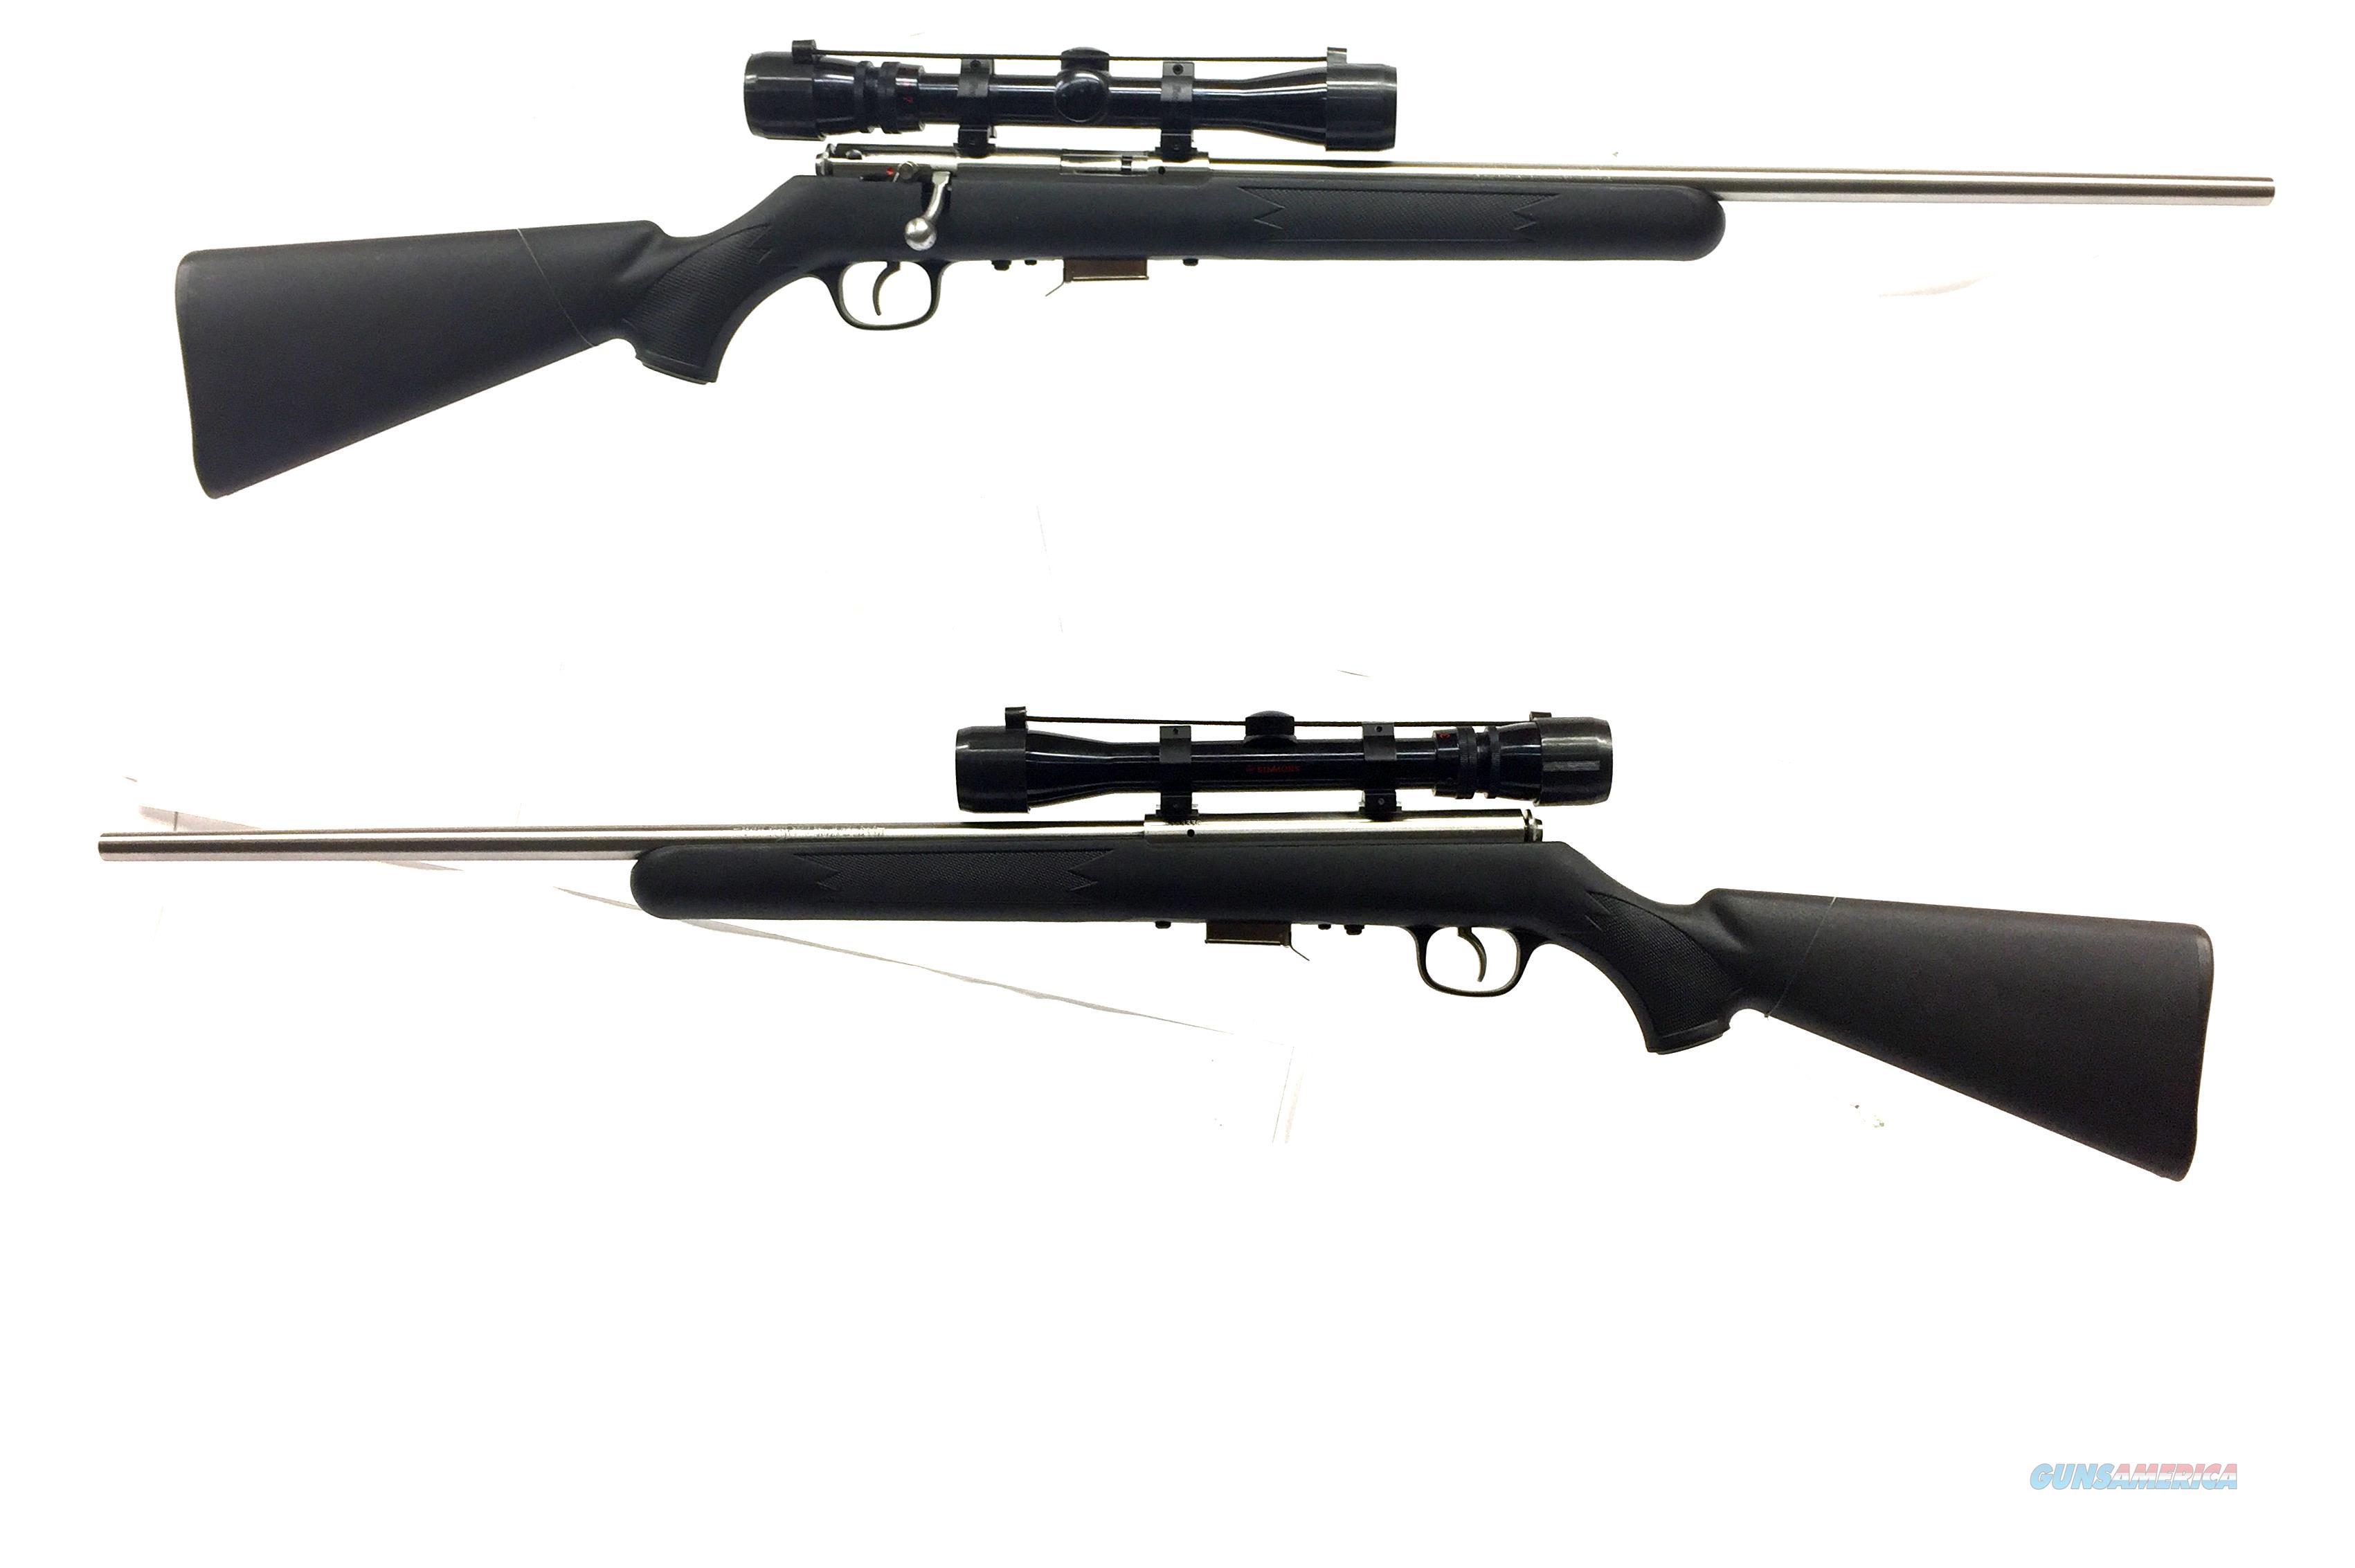 Savage Model 93R17 Bolt Action Rifle W/ Scope  Guns > Rifles > Savage Rifles > Standard Bolt Action > Sporting